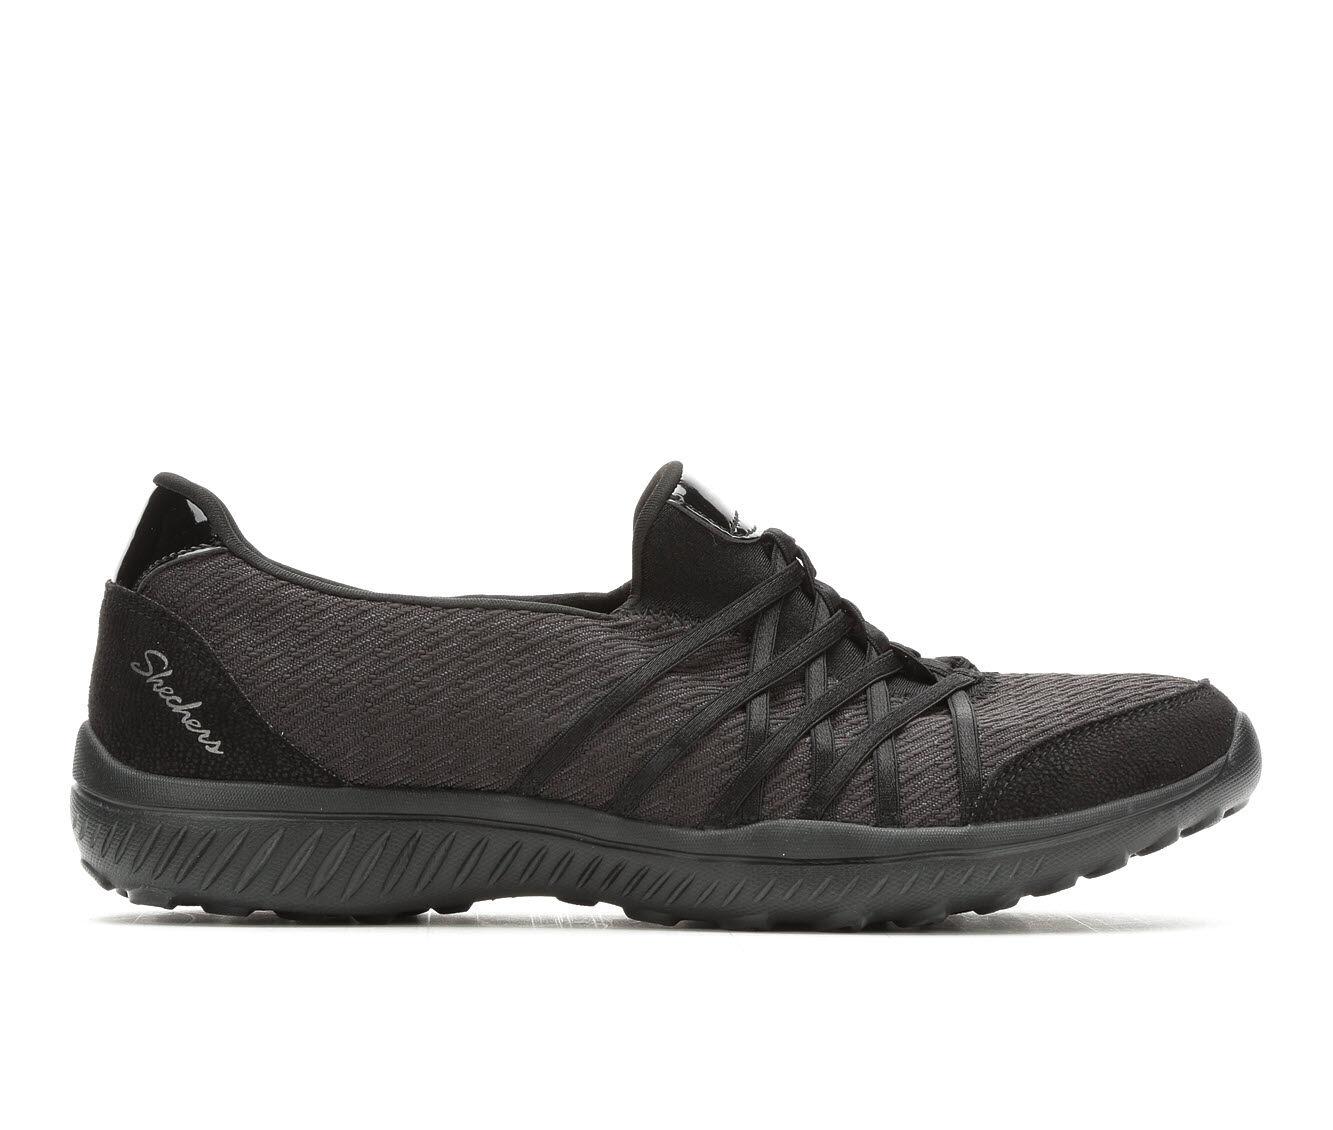 Women's Skechers Good Story 23286 Sneakers Black